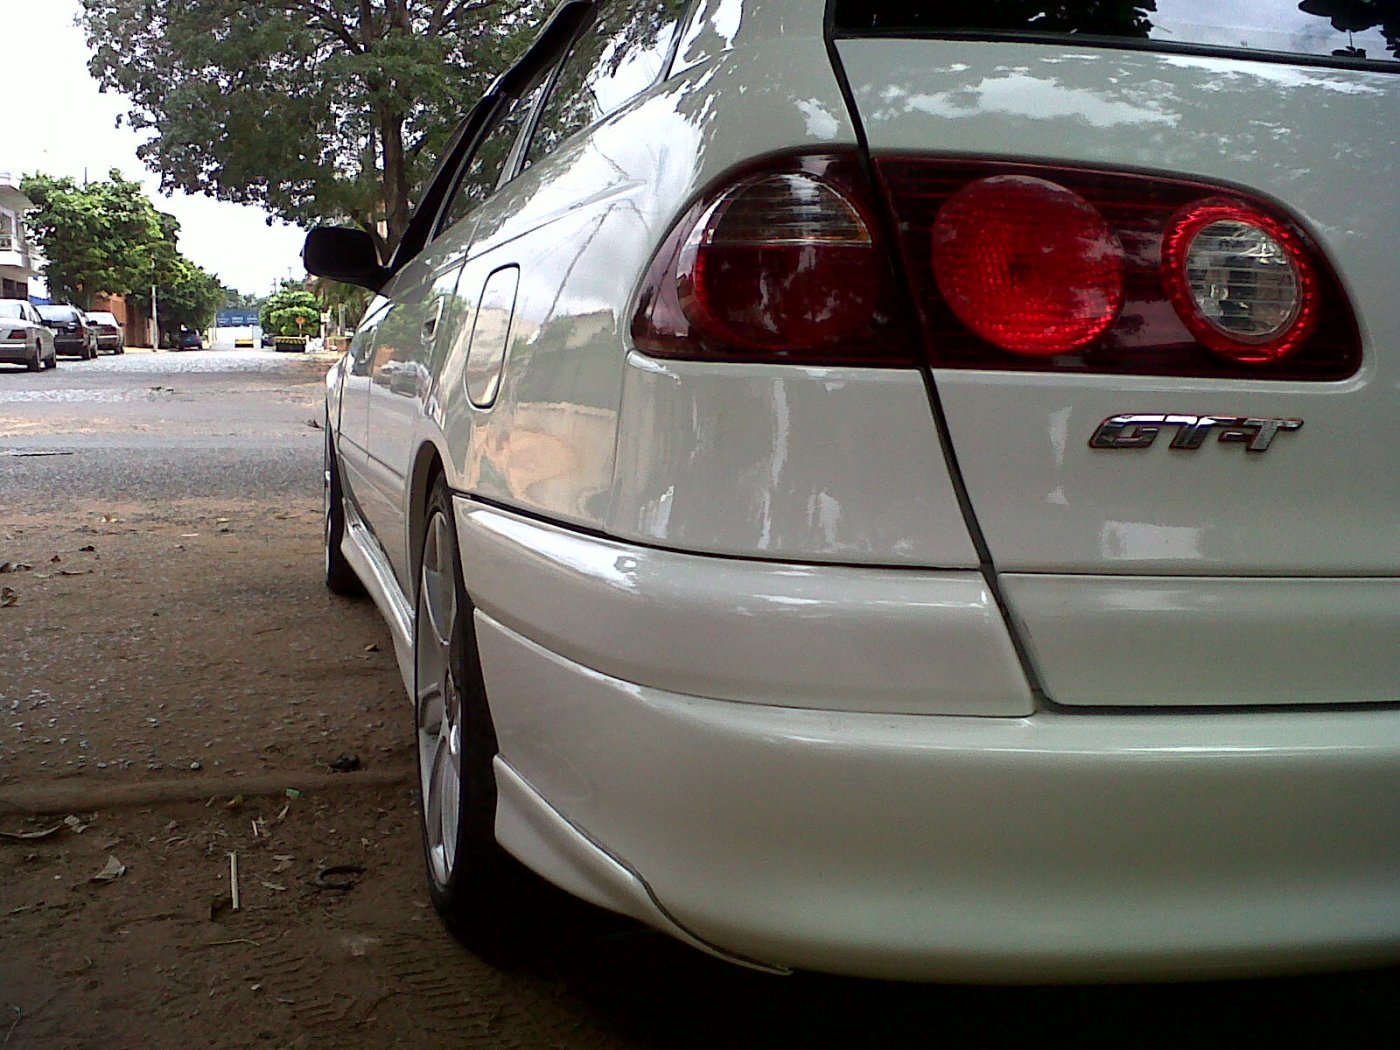 IMG00444-20121111-1218.jpg